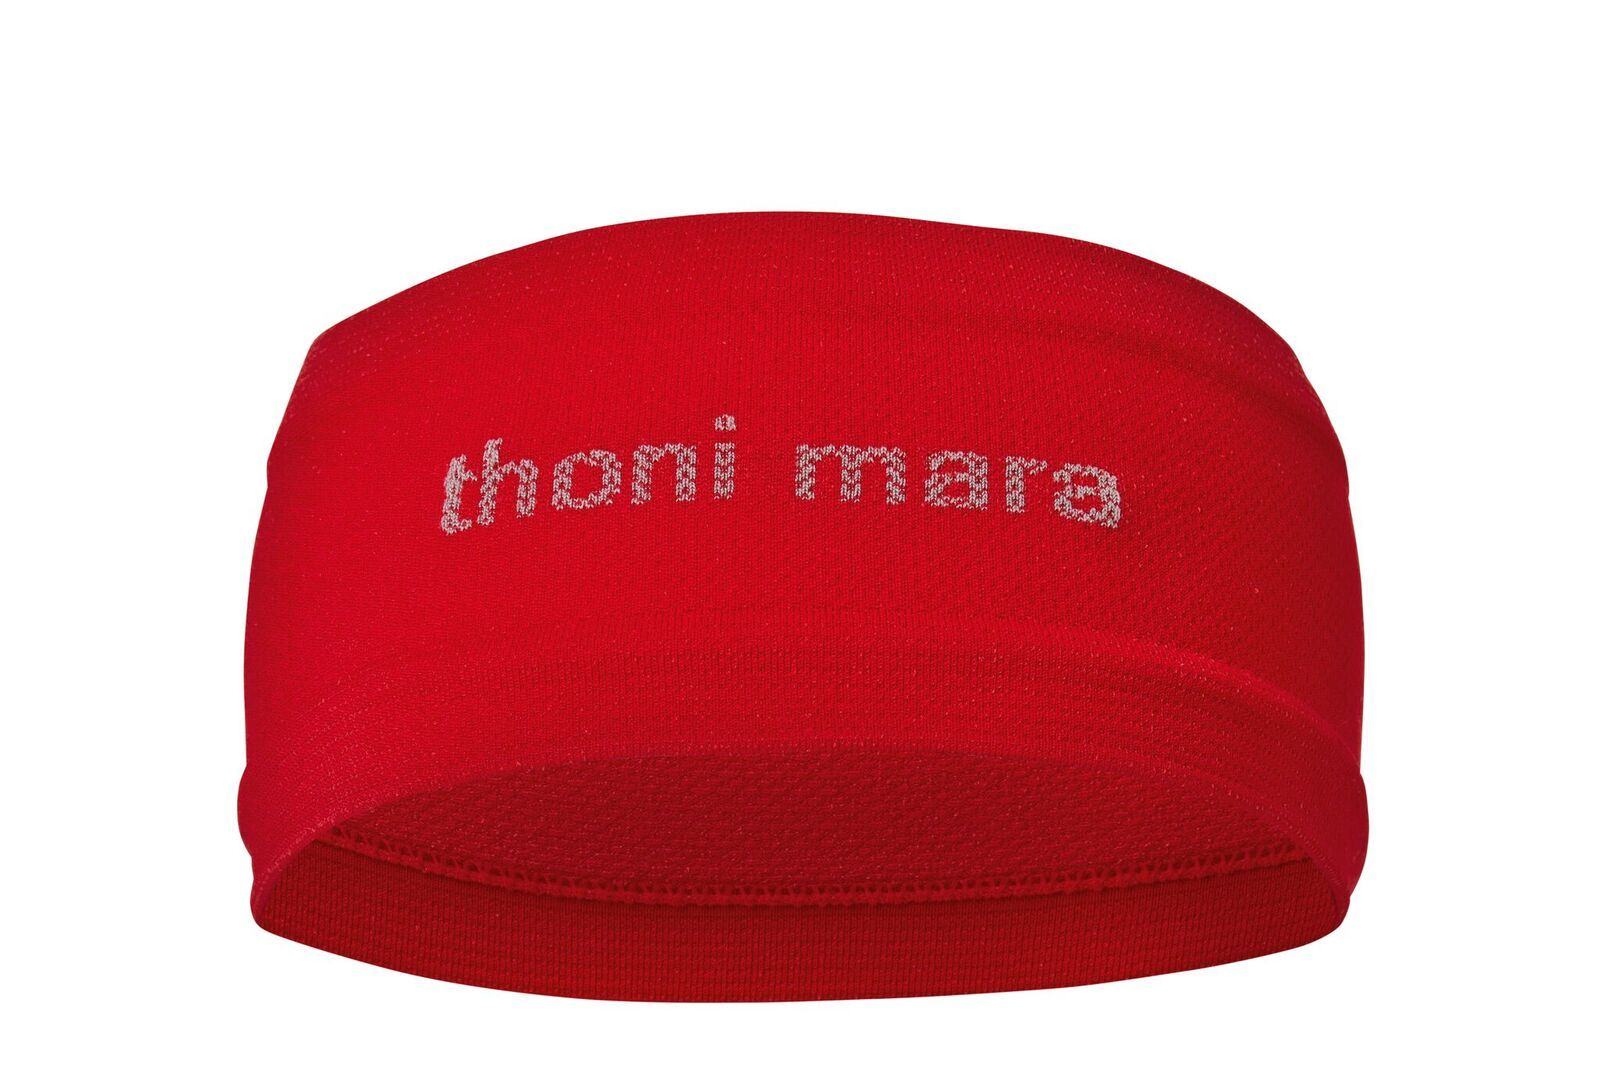 Thonimara Stirnband mini in Rot